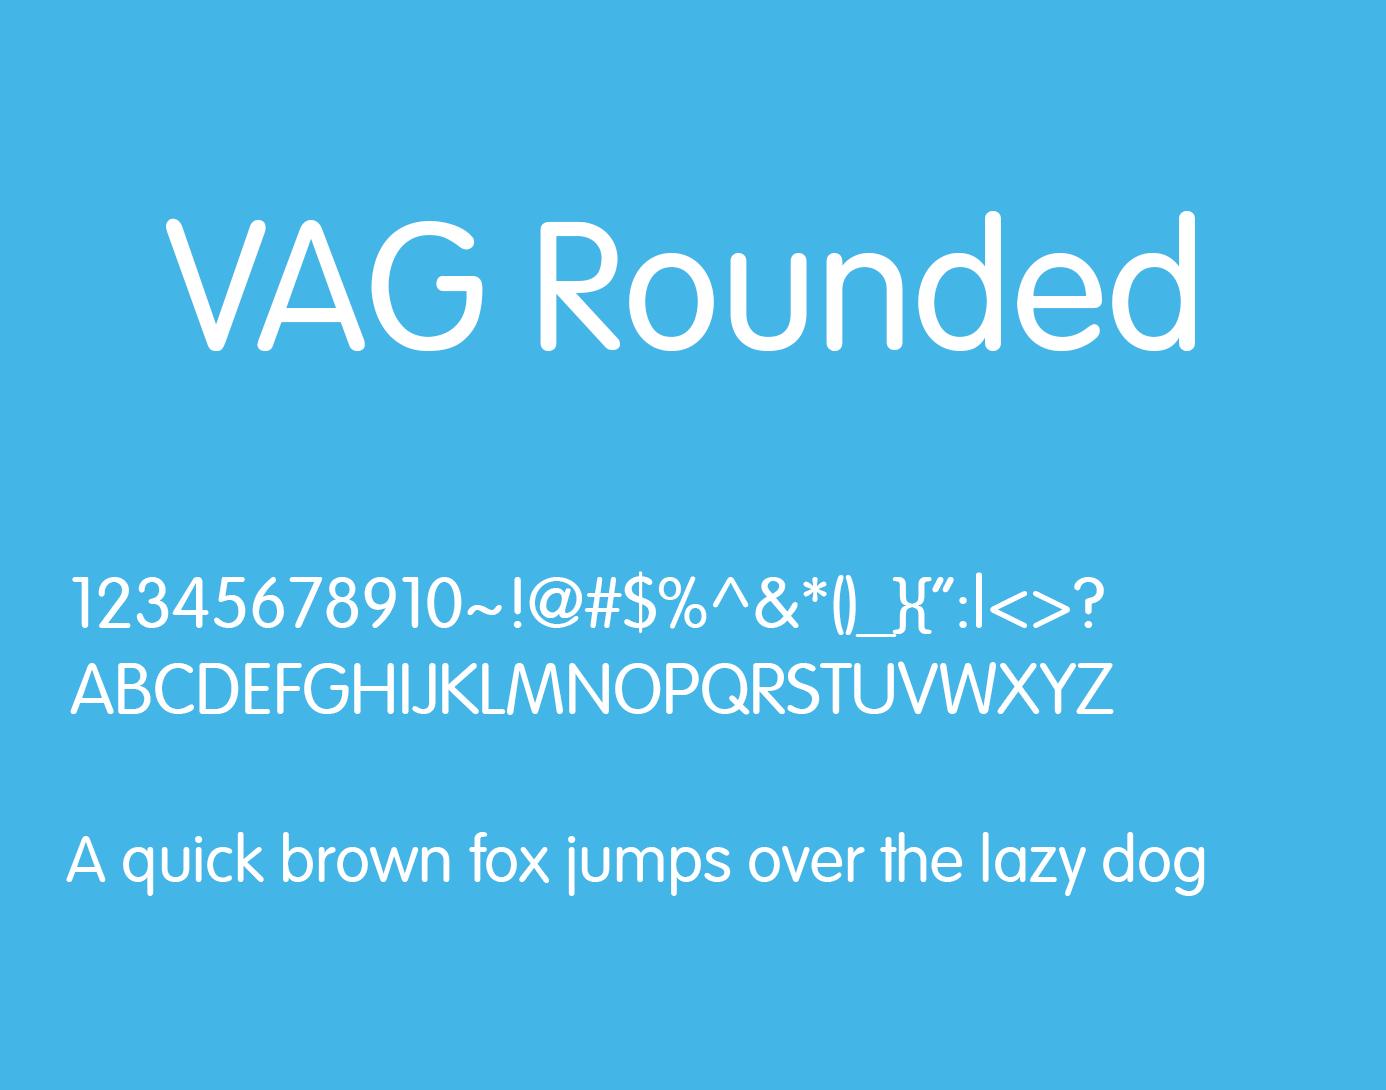 VAG Rounded Font Free Download - Free Fonts | Sans Serif Fonts